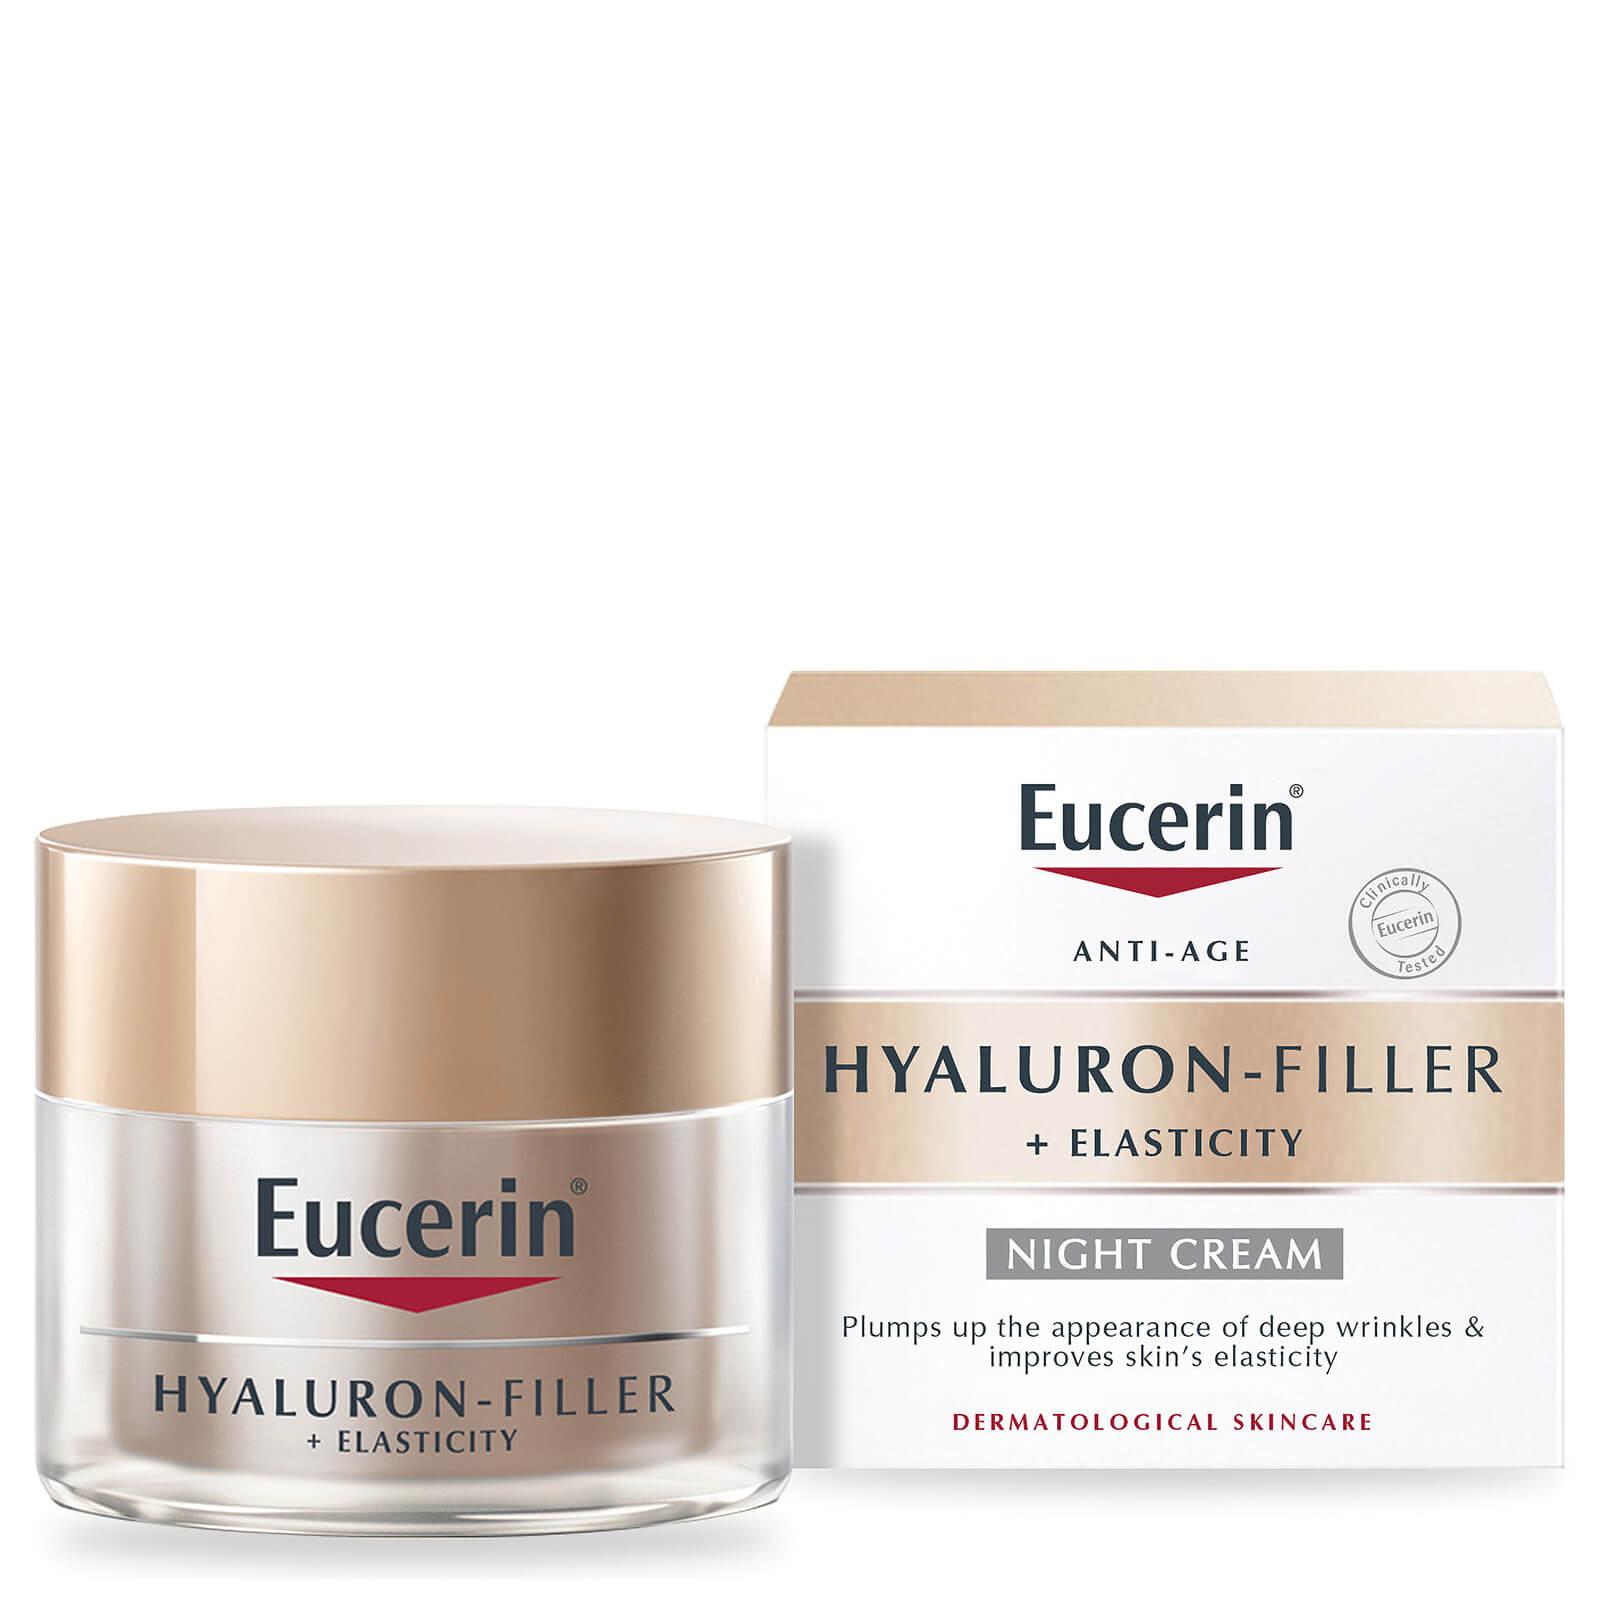 Image of Eucerin Hyaluron-Filler + Elasticity Night Cream 50ml